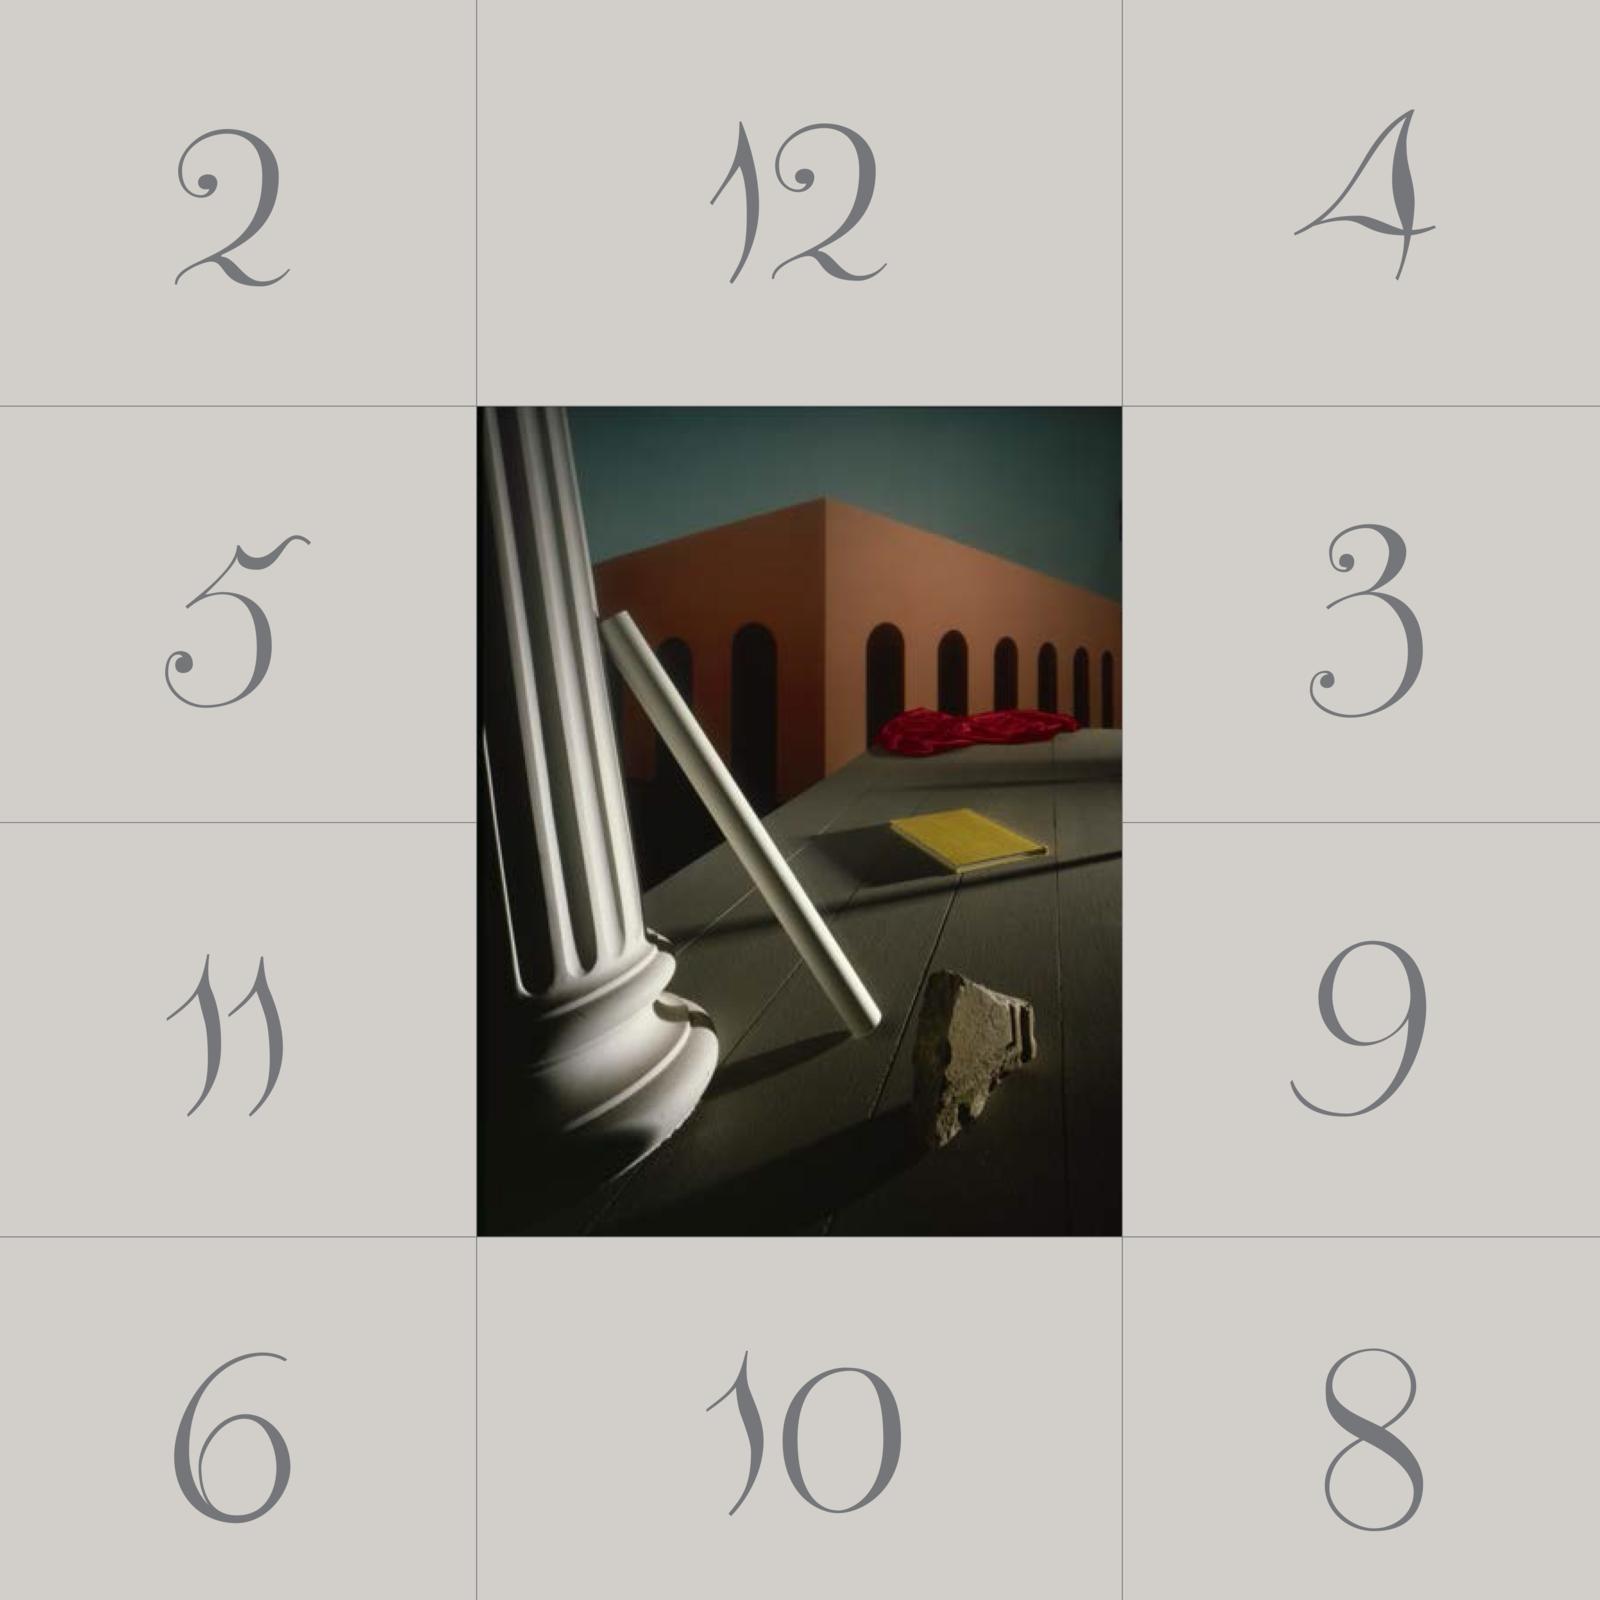 Thieves Like Us - New Order - Musik - RHINO - 0190295665890 - October 2, 2020